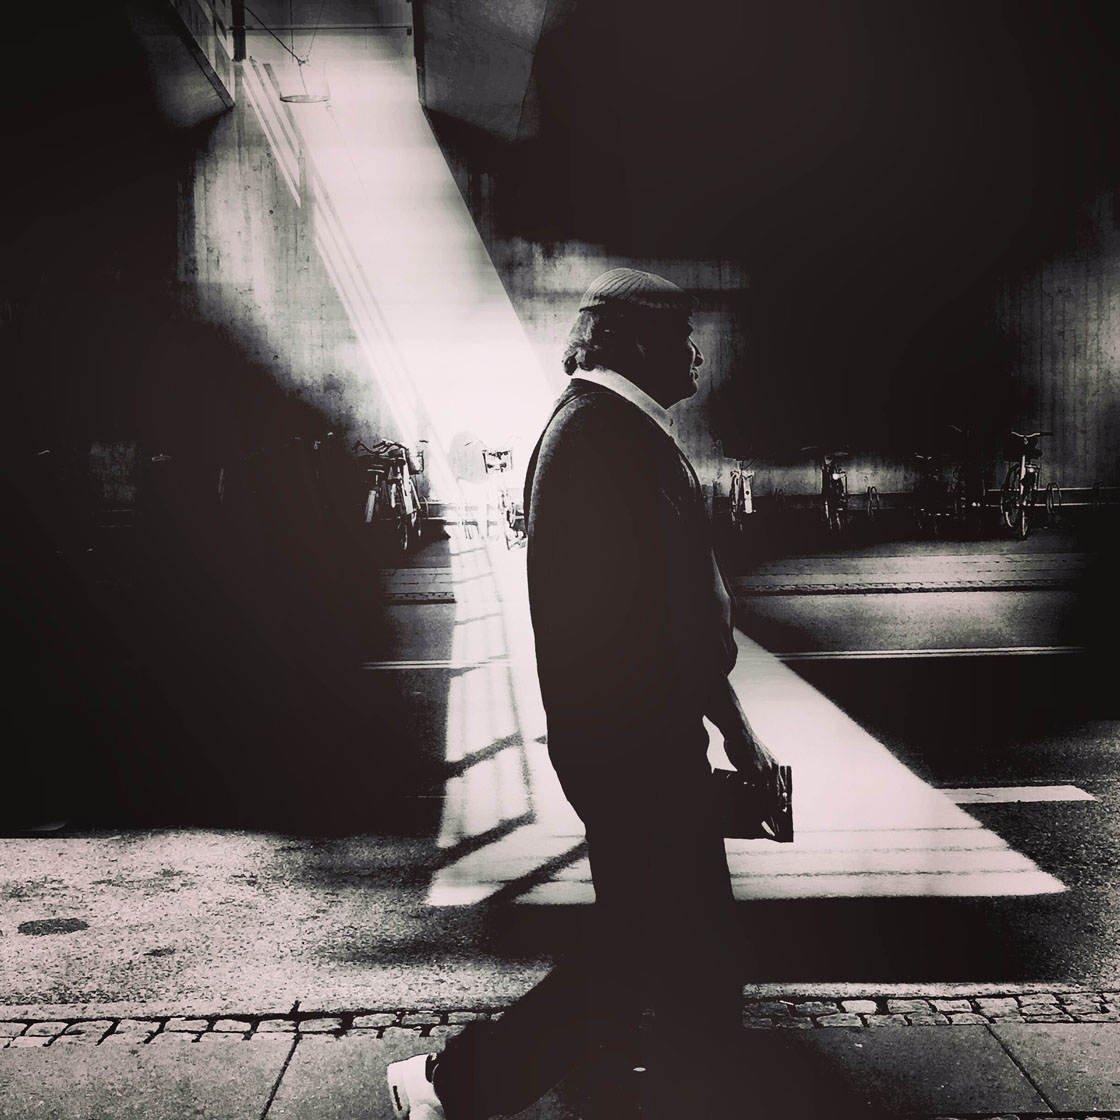 iPhone Street Photos Of Strangers 48 no script